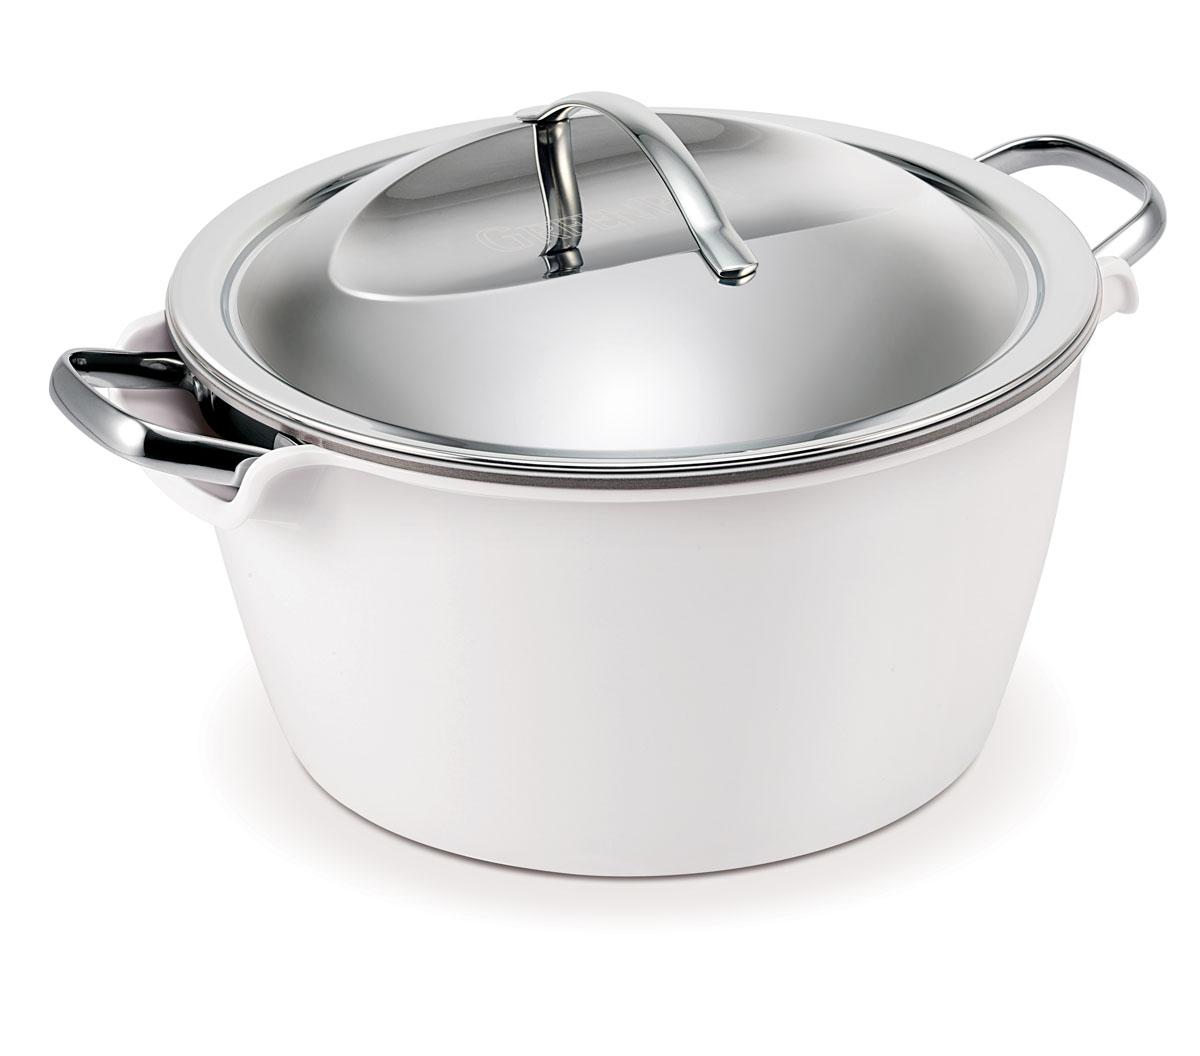 "GreenPan Набор посуды Essentials ""Hot Pot"", 5 предметов. CW0002240"